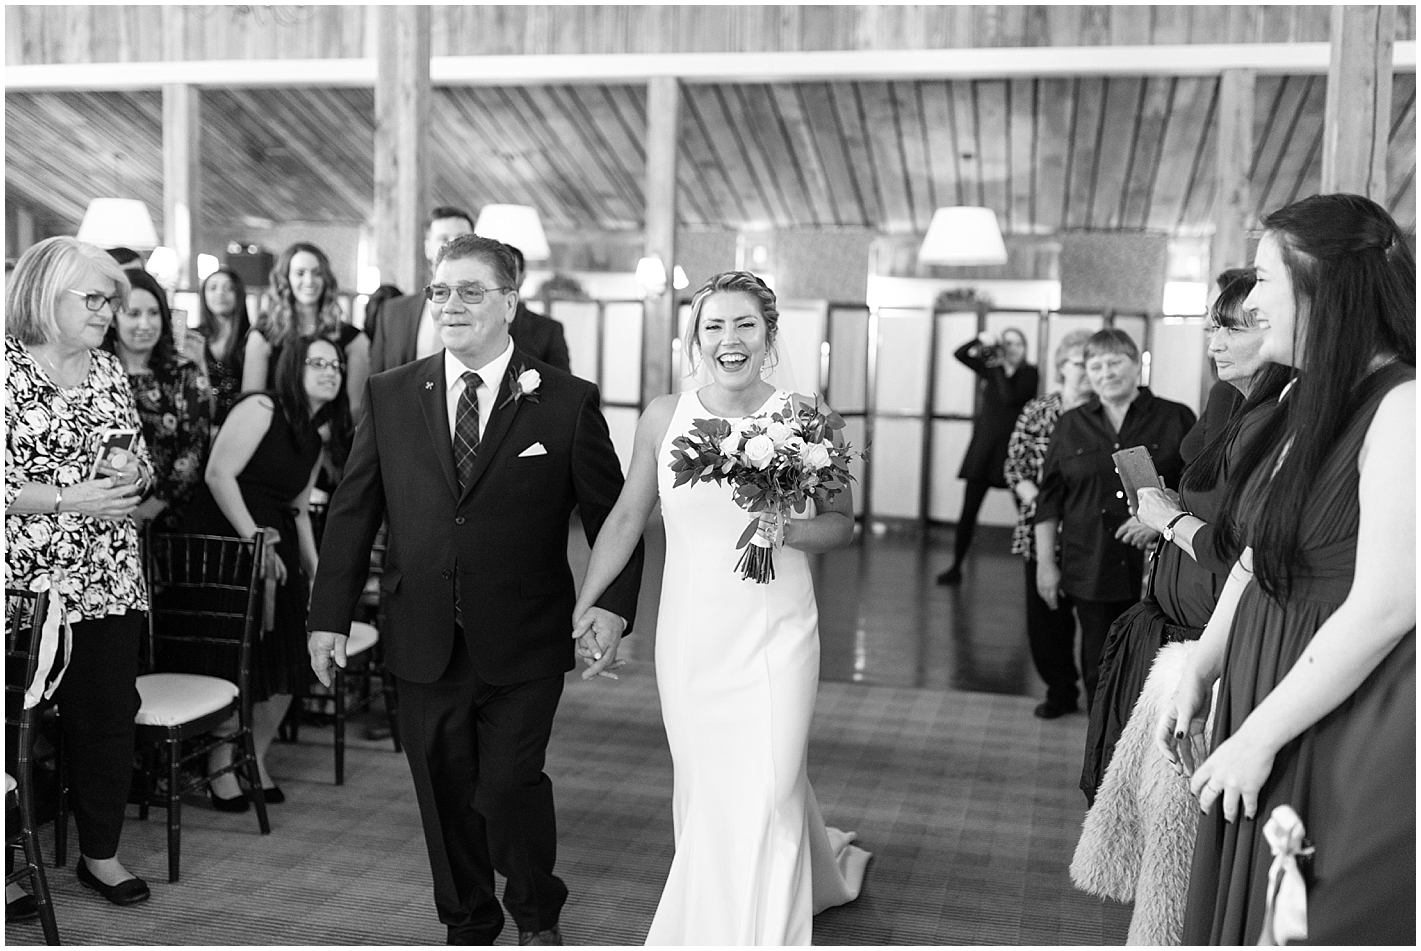 Bride walking down aisle Photos by Alyssa Parker Photography